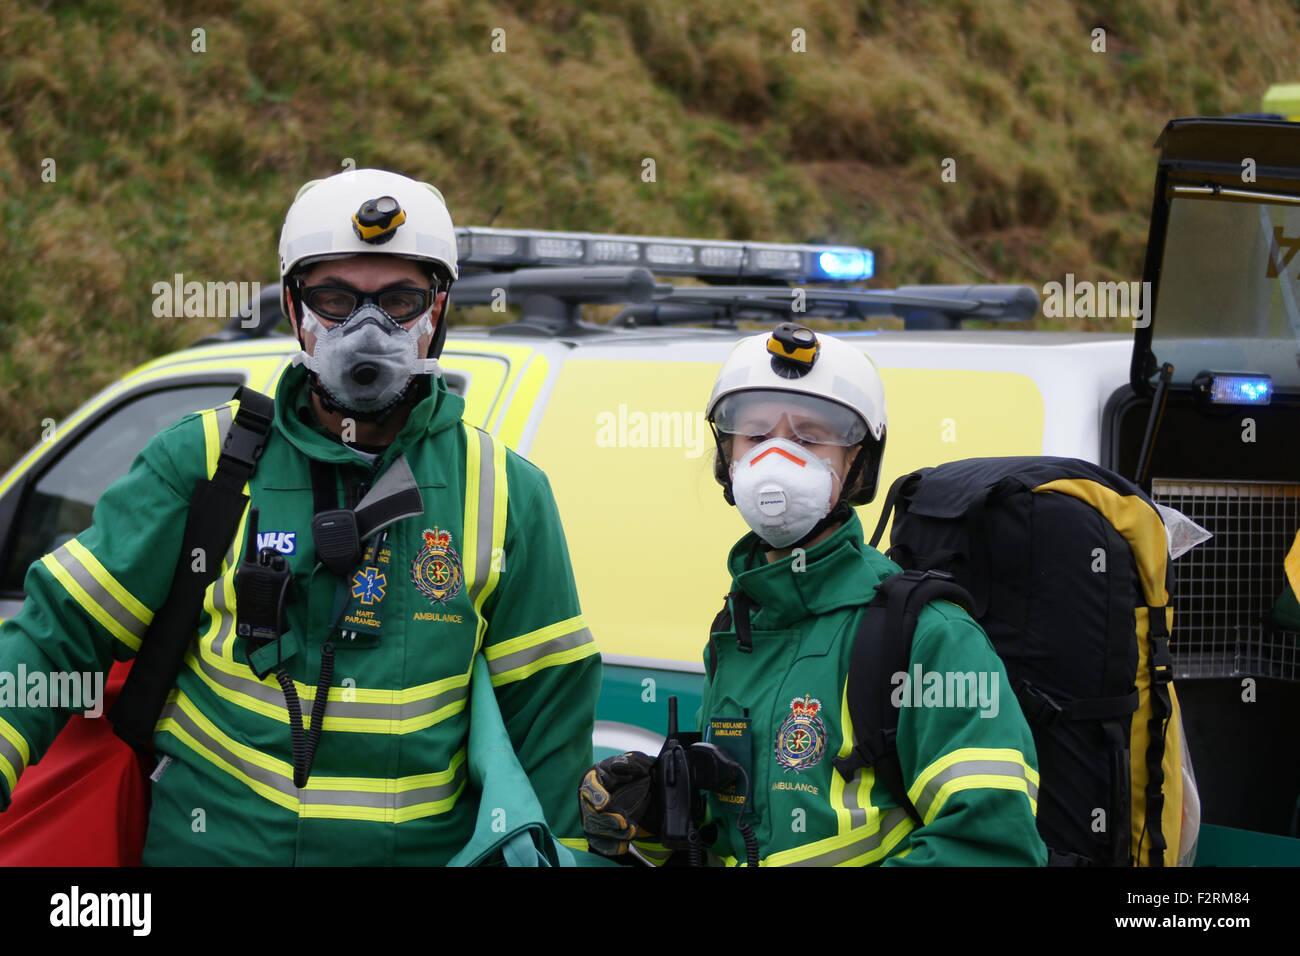 Hazardous Area Response Team at disaster zone, HART Team - Stock Image